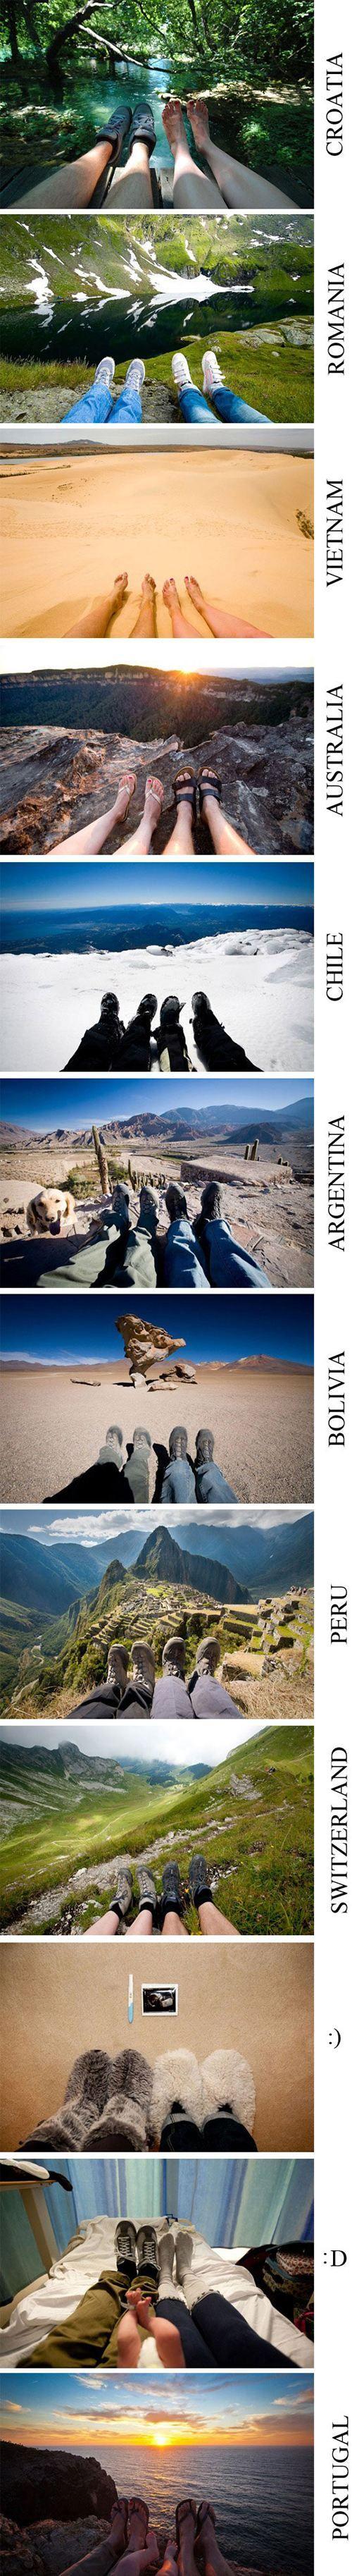 traveling photos